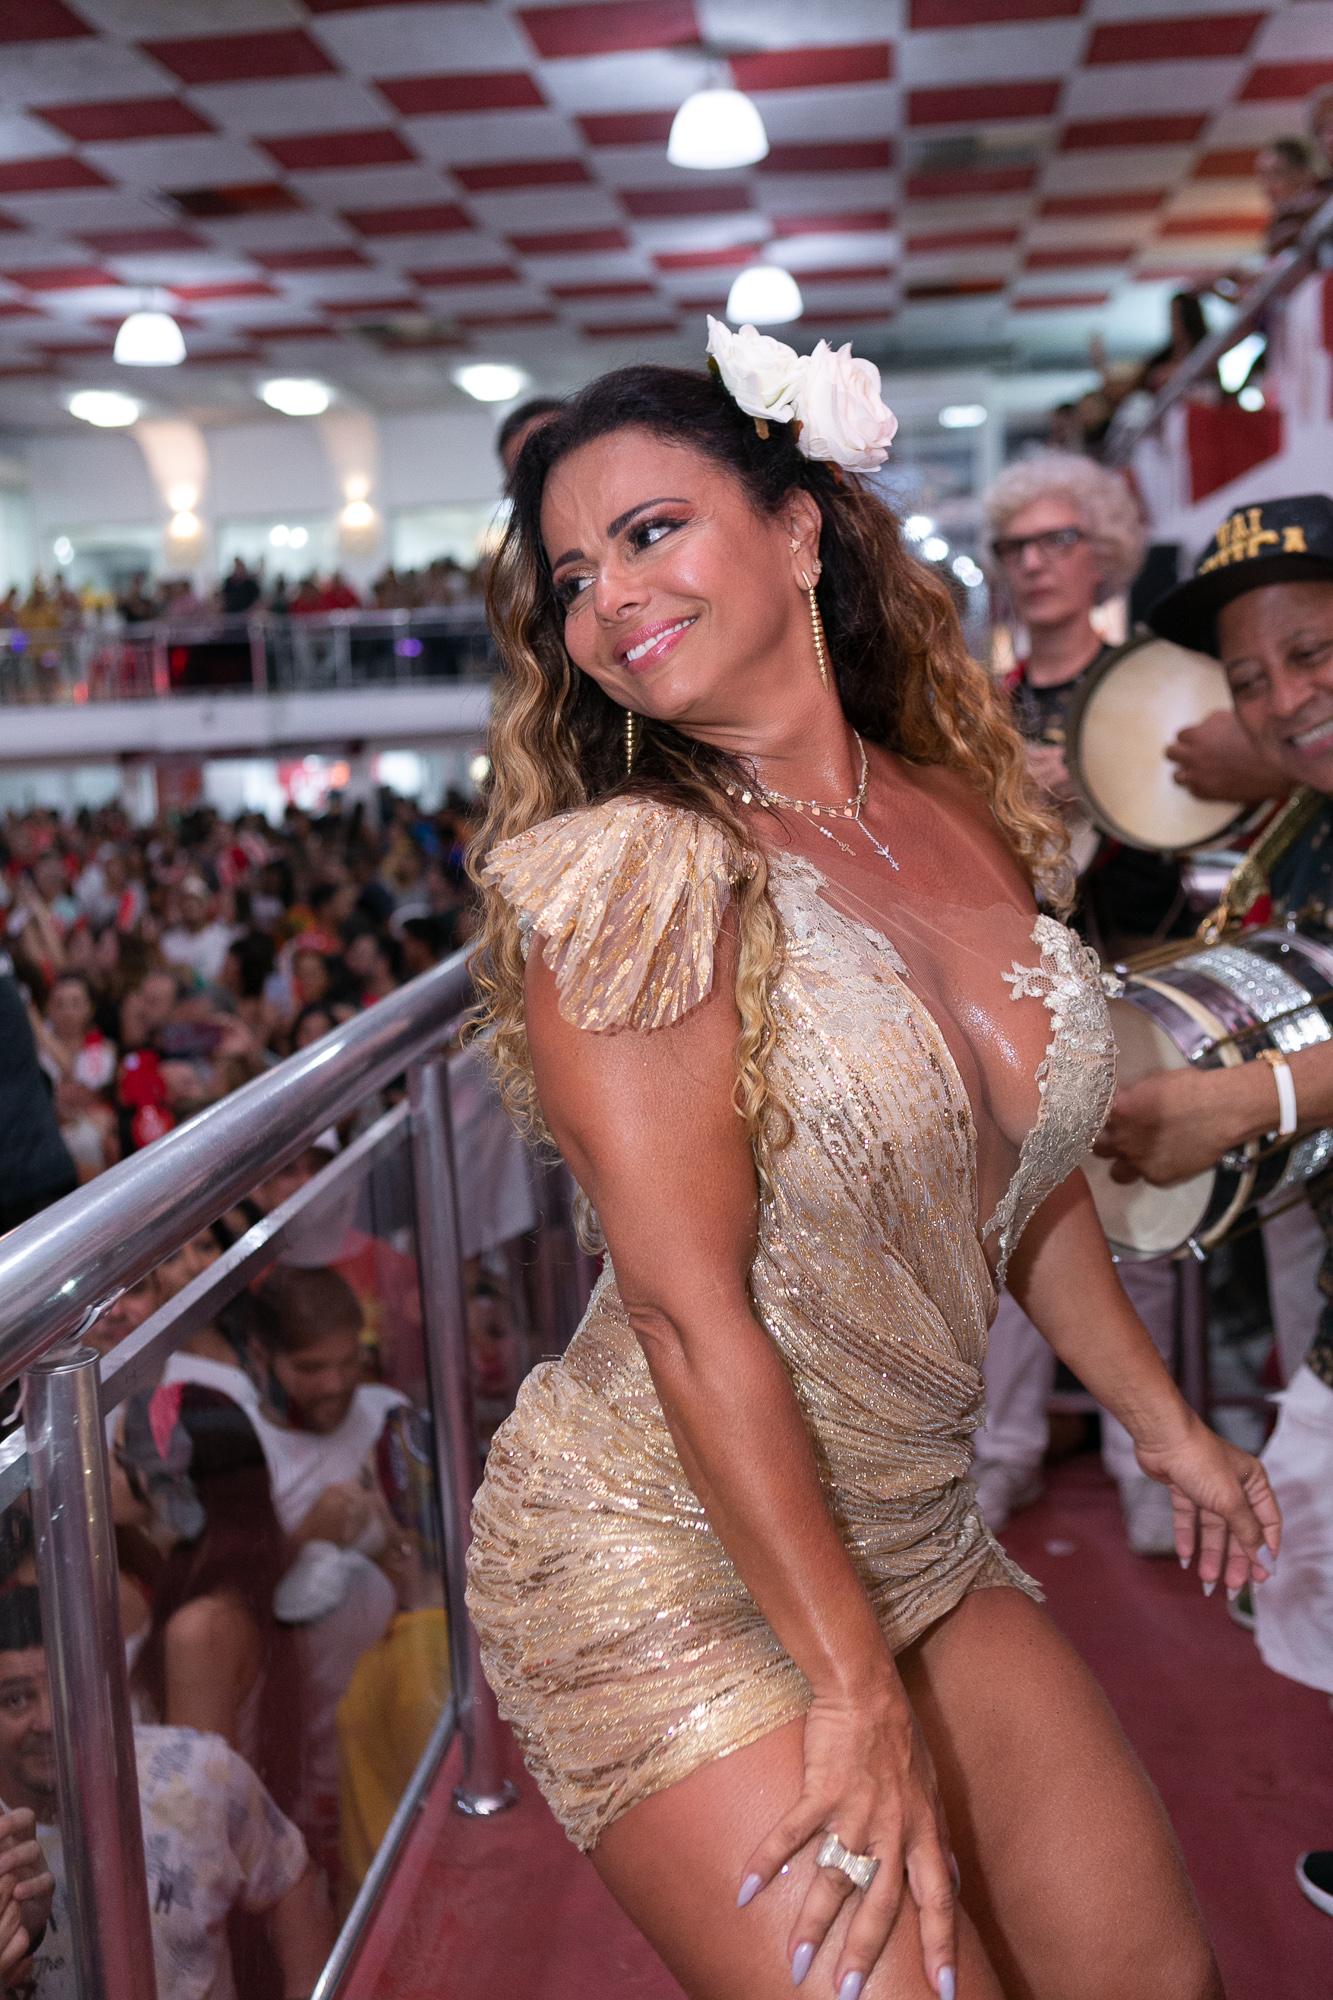 Viviane Araújo samba e diverte foliões na quadra do Salgueiro